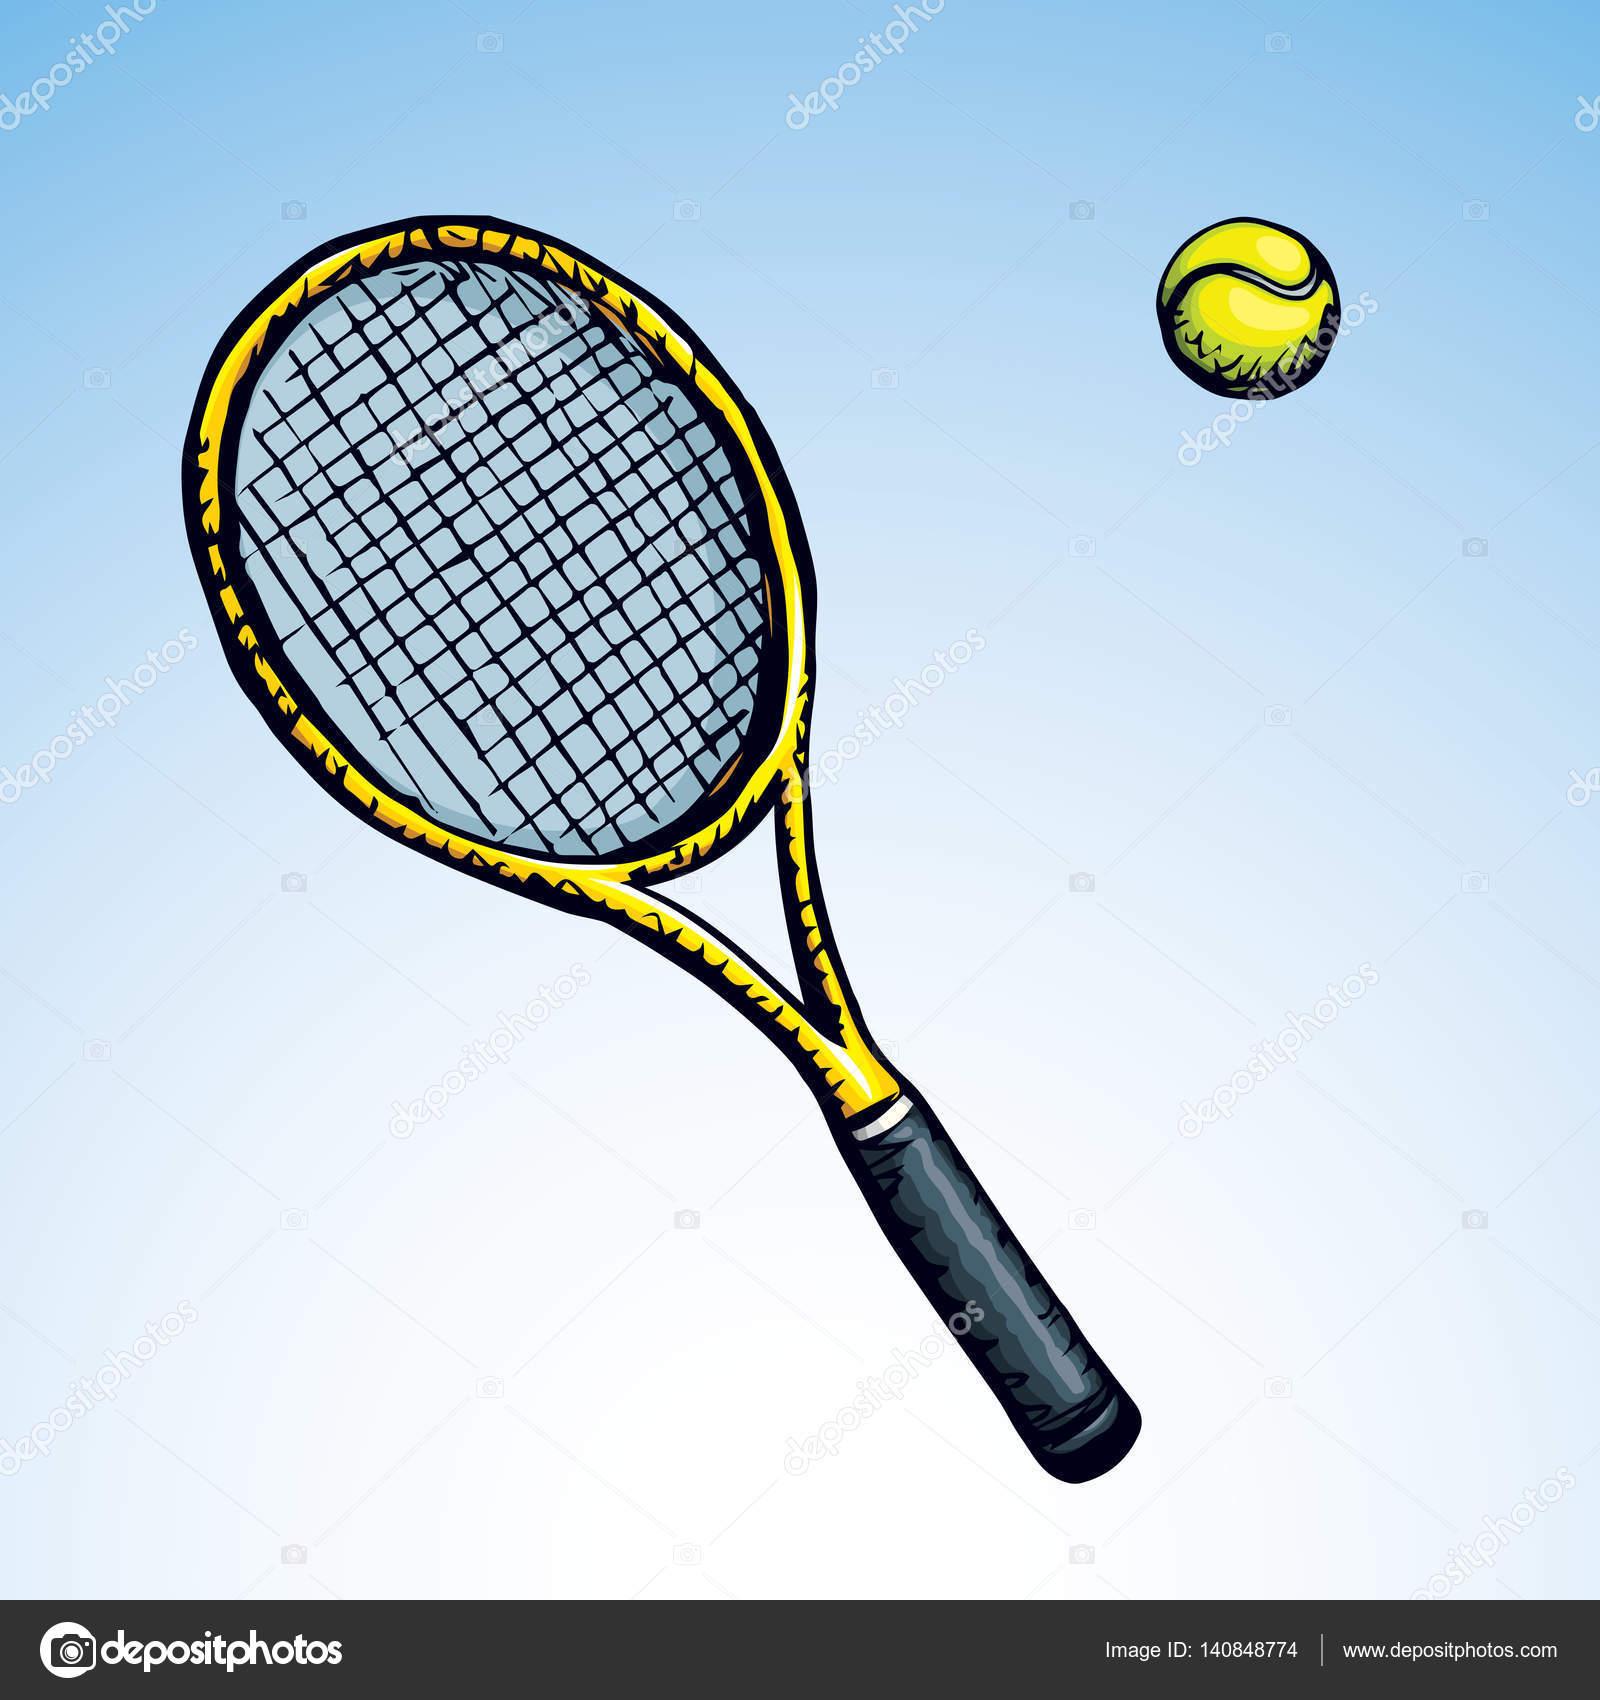 Tennis Racket And Ball Vector Drawing Stock Vector C Marinka